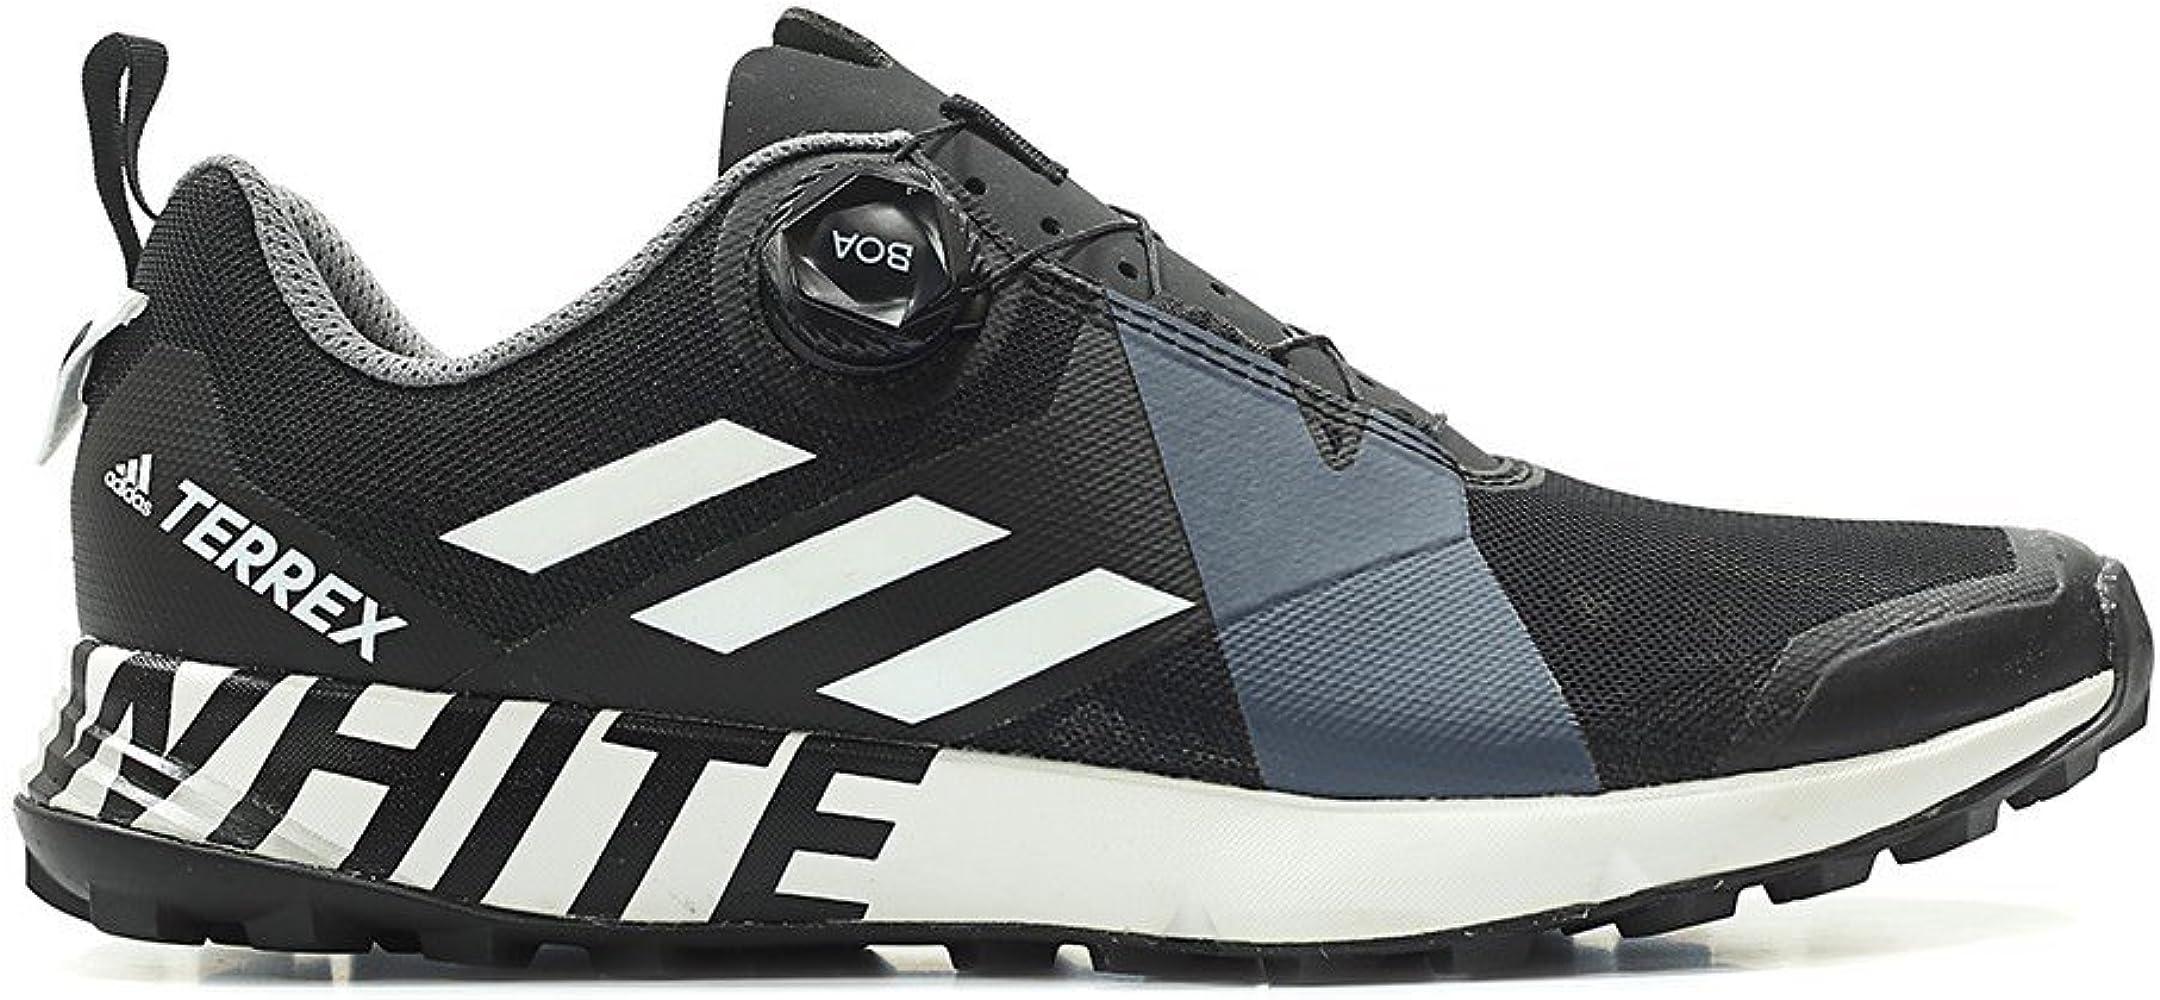 Cumplir Demostrar es bonito  Amazon.com | adidas Men White Mountaineering Terrex Two Boa Black Footwear  White core Black Size 8.0 US | Fashion Sneakers